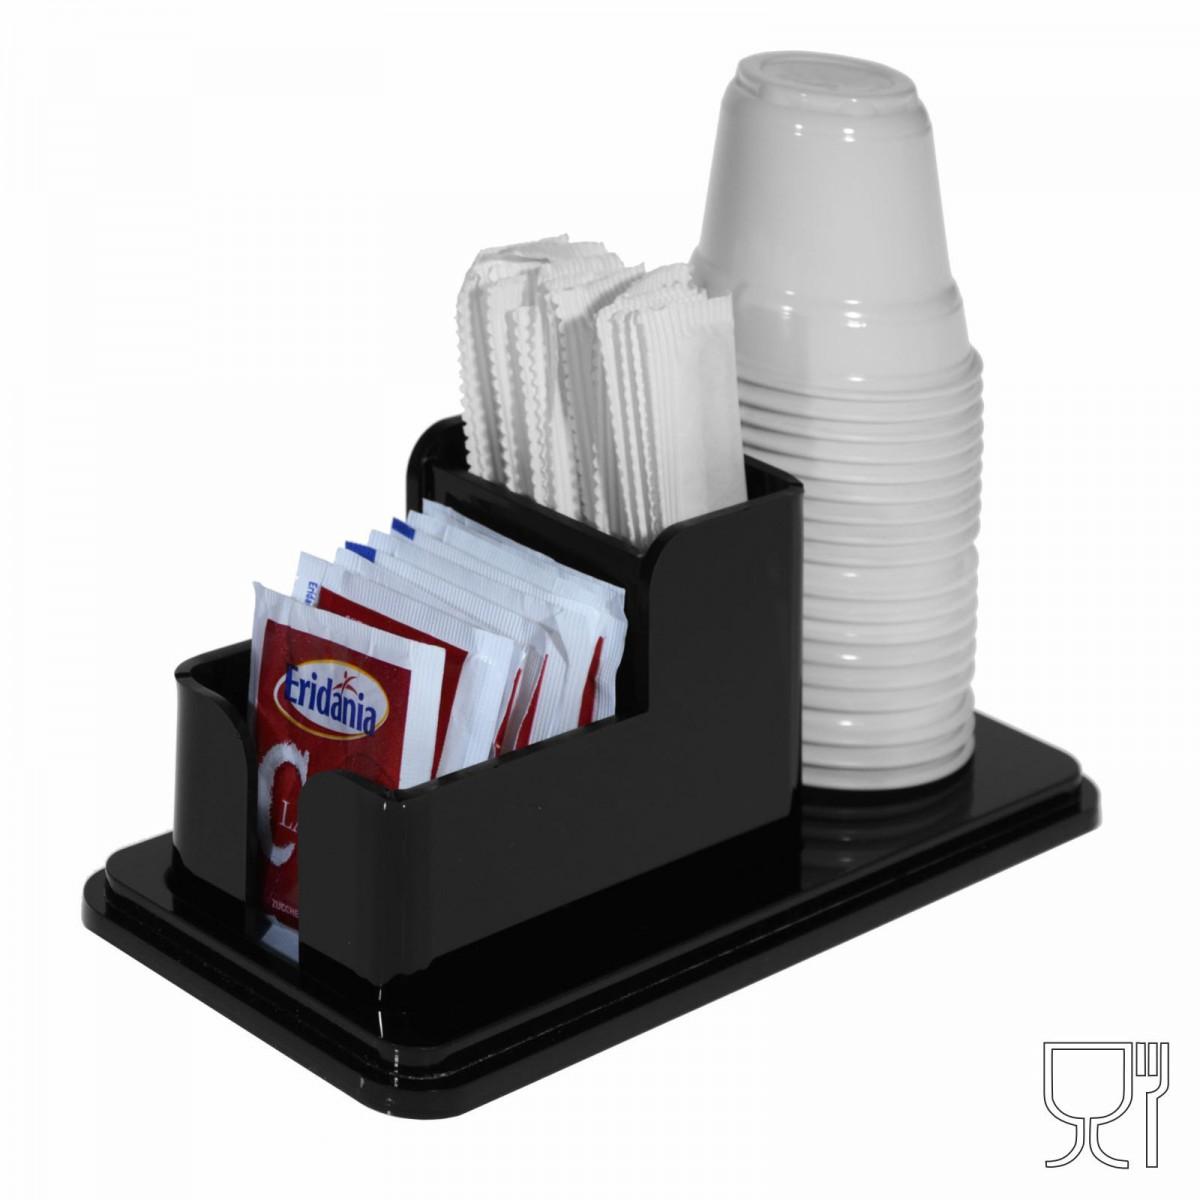 E-228 POB-I - Porta bustine zucchero, palette e bichieri in plexiglass nero a 3 postazioni - CM(LxPxH): 18x8.5x7